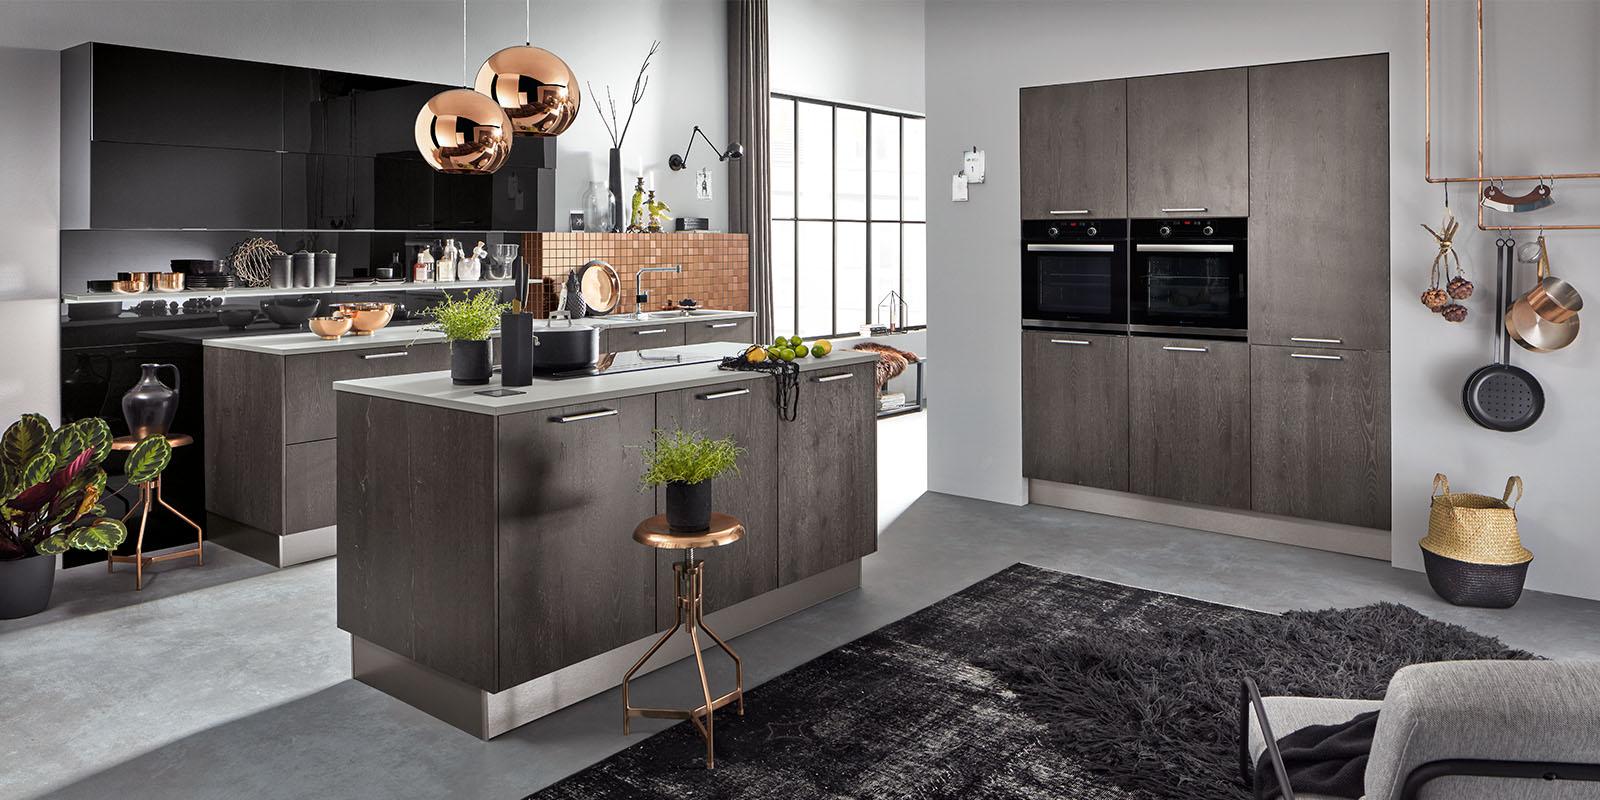 k chen monsator hausger te magdeburg gmbh. Black Bedroom Furniture Sets. Home Design Ideas